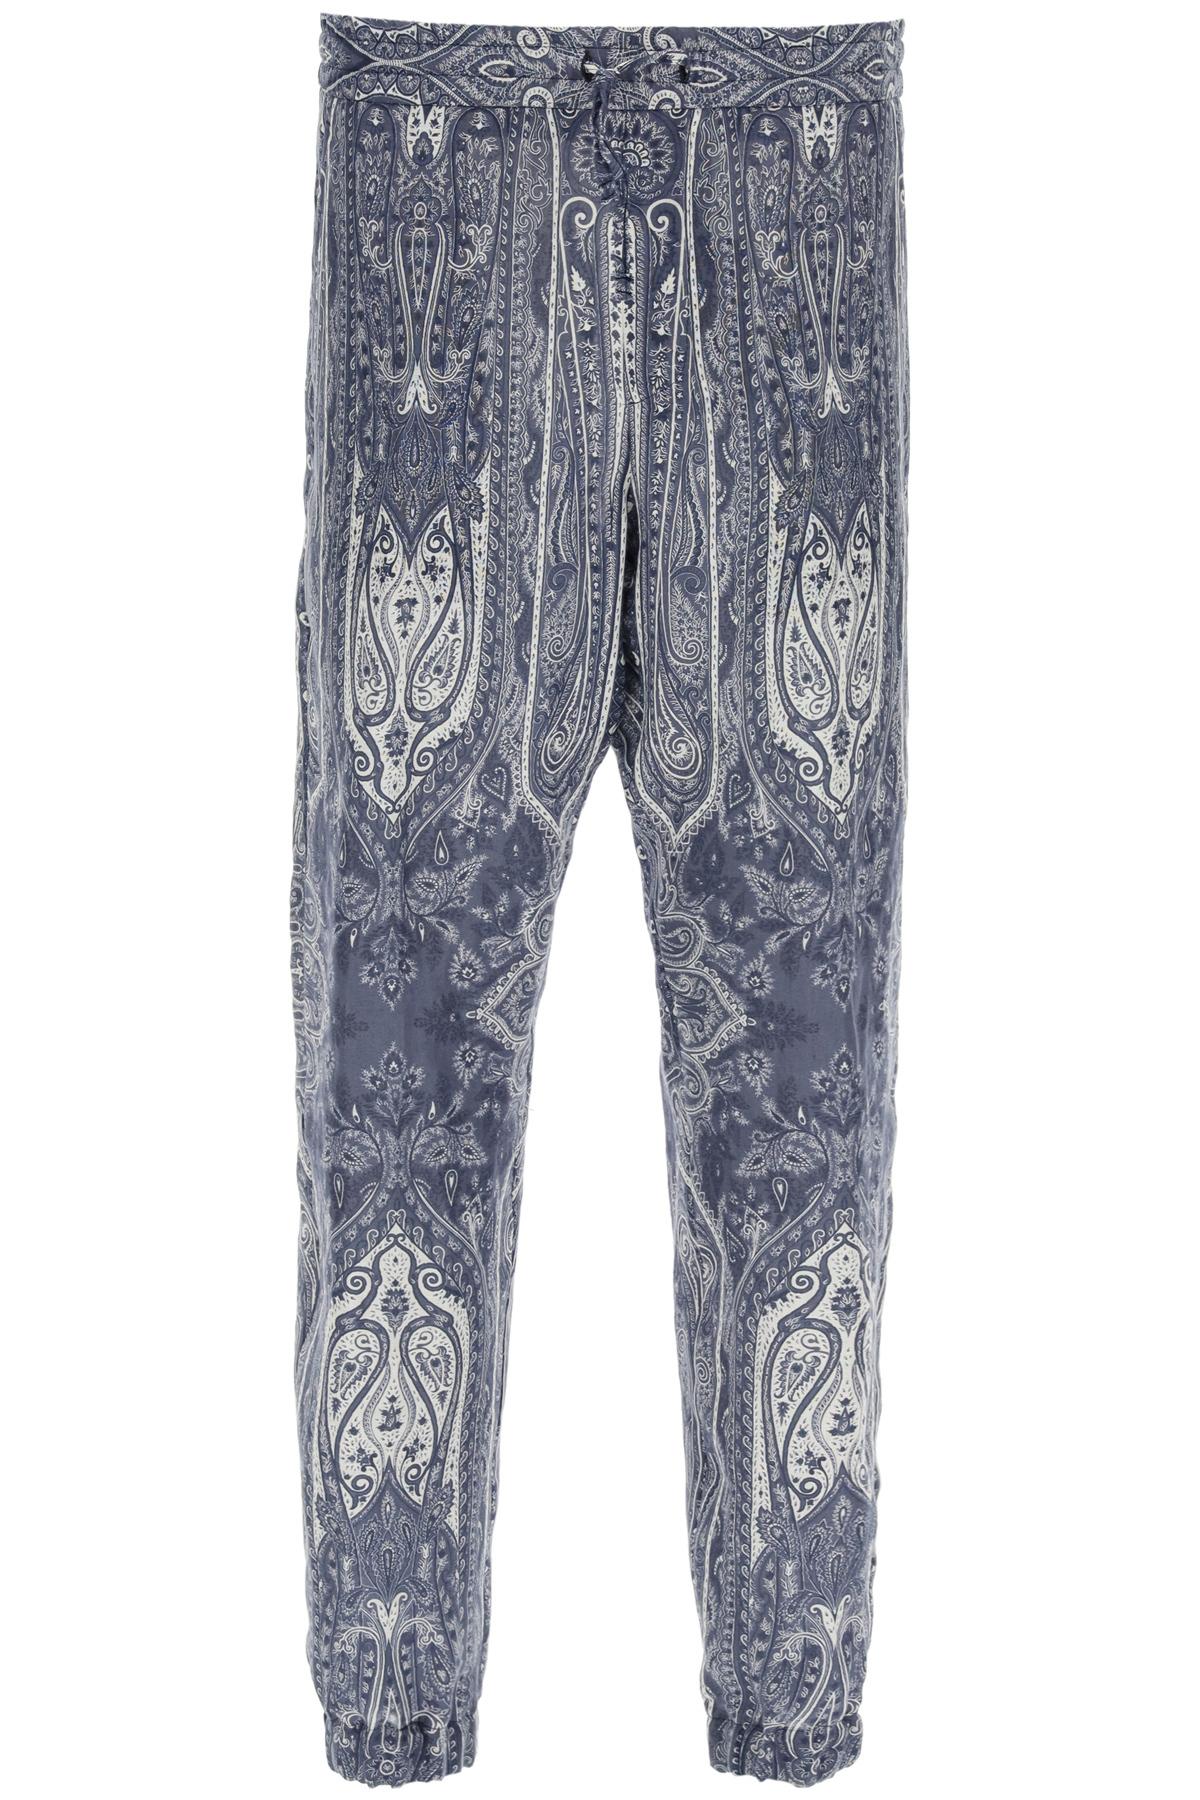 Etro pantaloni jogger stampa paisley